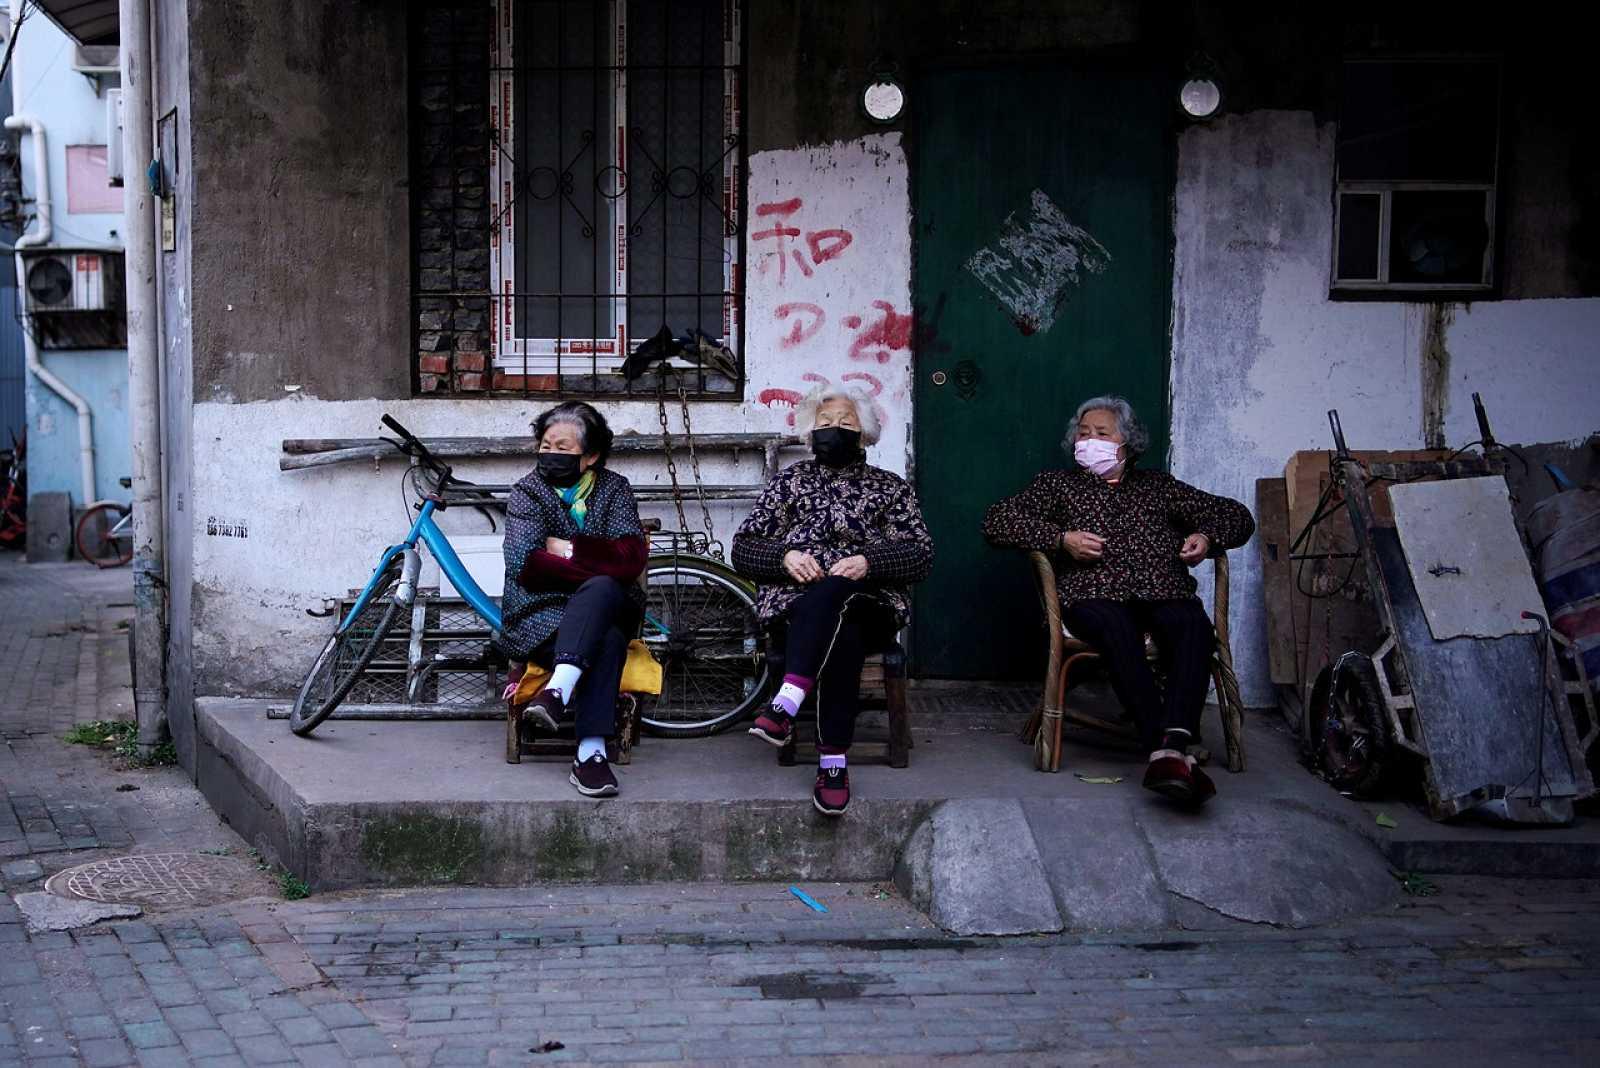 Residentes con máscaras en una zona residencial bloqueada en Wuhan